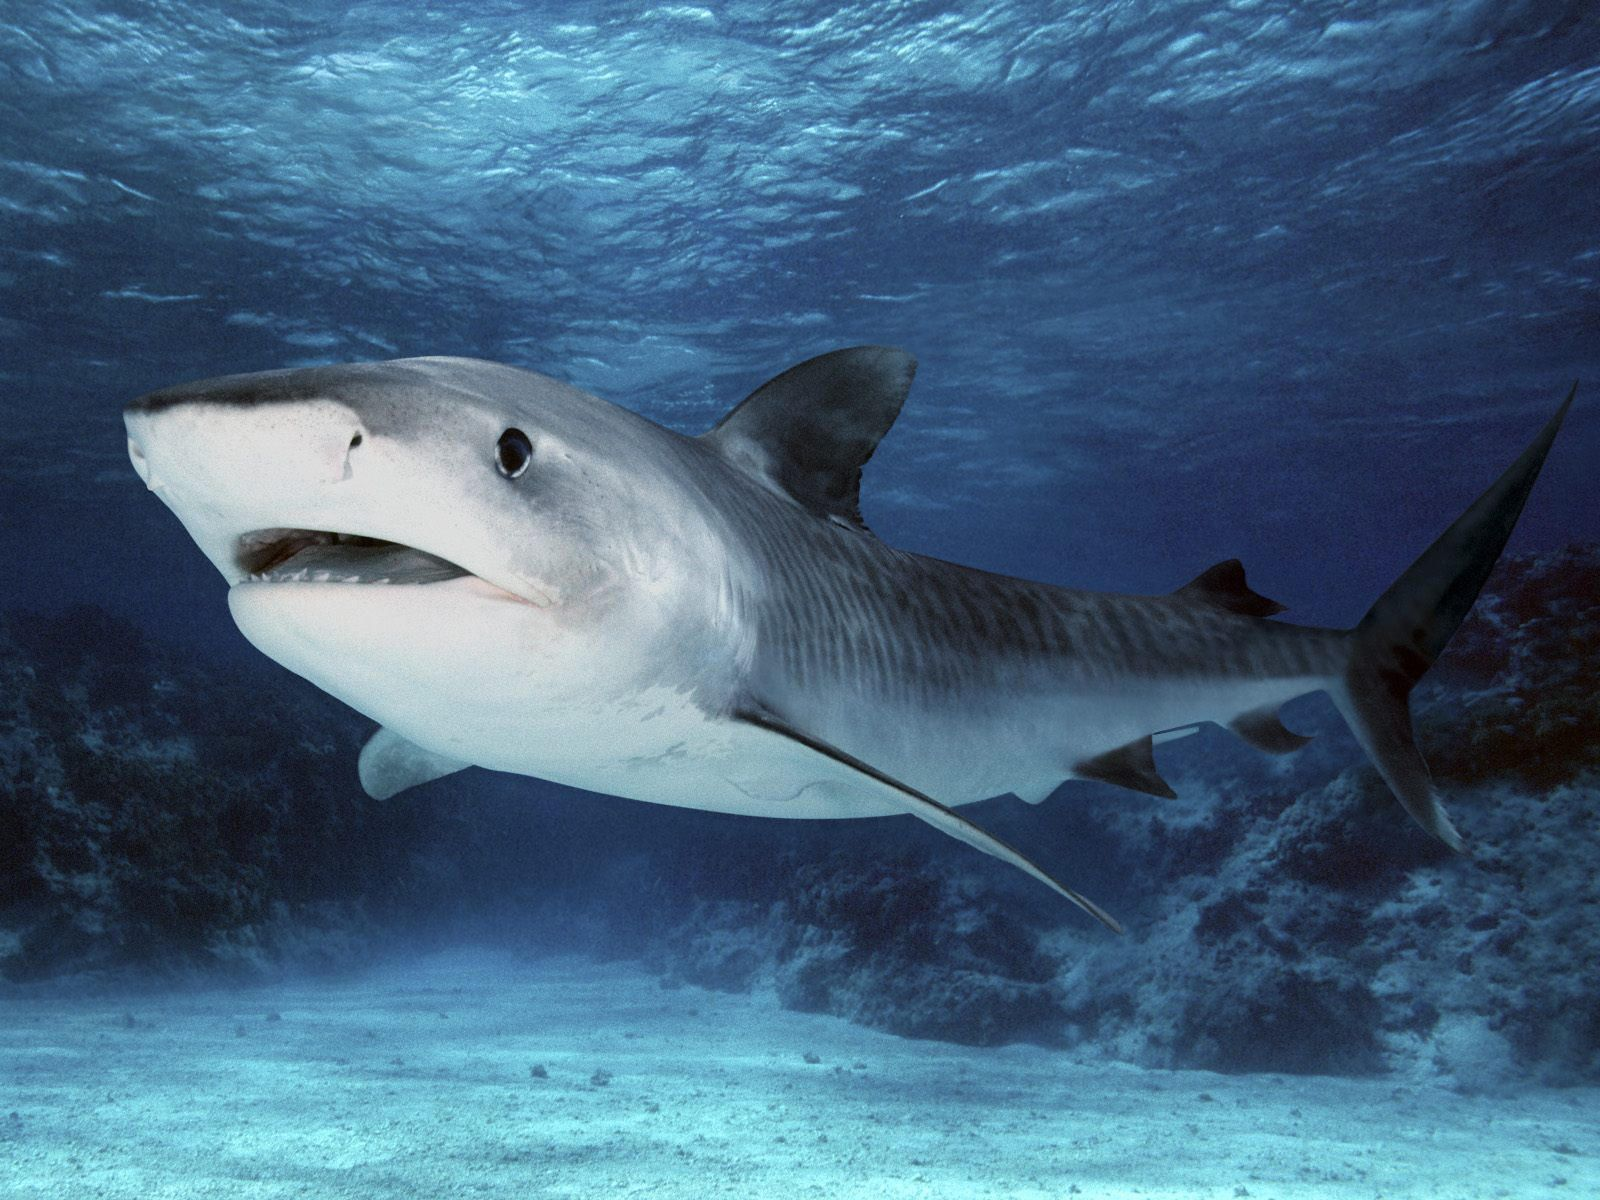 Tiger Shark Wallpaper Jpg Shark Pictures Great Barrier Reef Shark